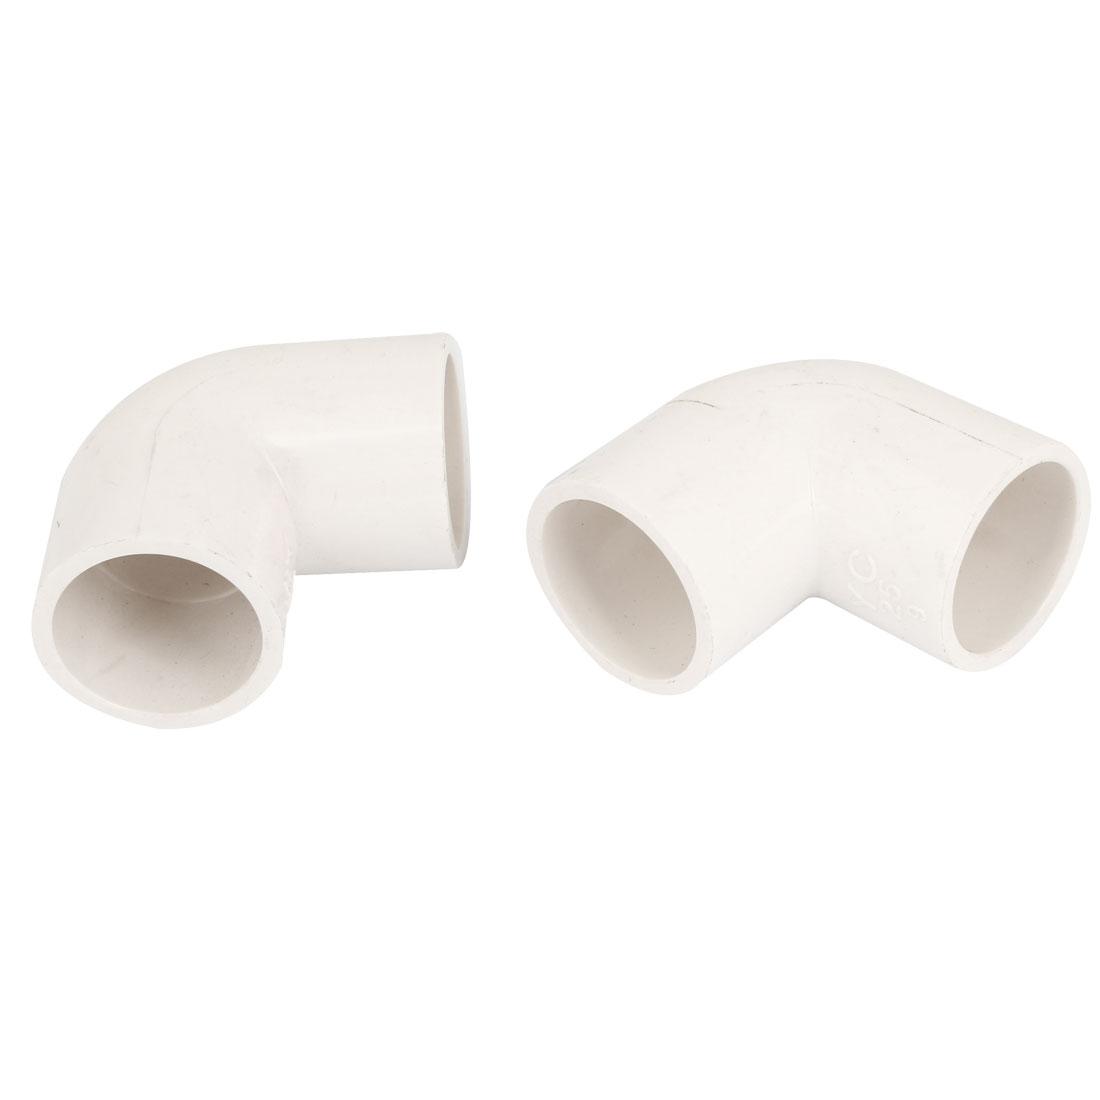 25mm Inner Diameter 90 Degree Elbow PVC Pipe Connector Fittings White 2 Pcs